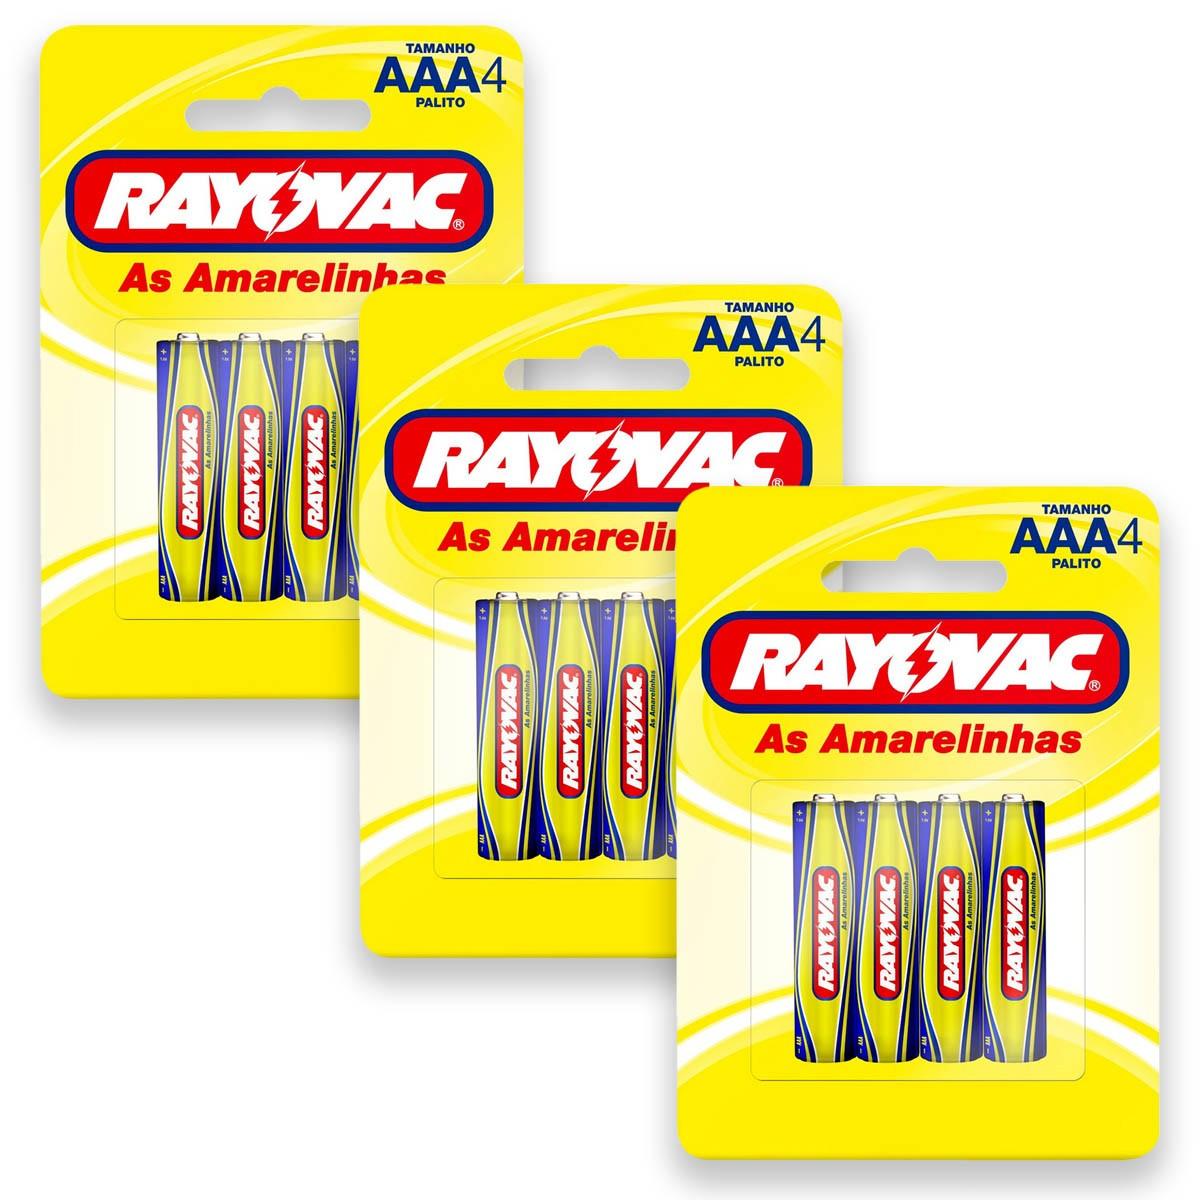 12 Pilhas AAA Zinco Carvão RAYOVAC 3 cartelas